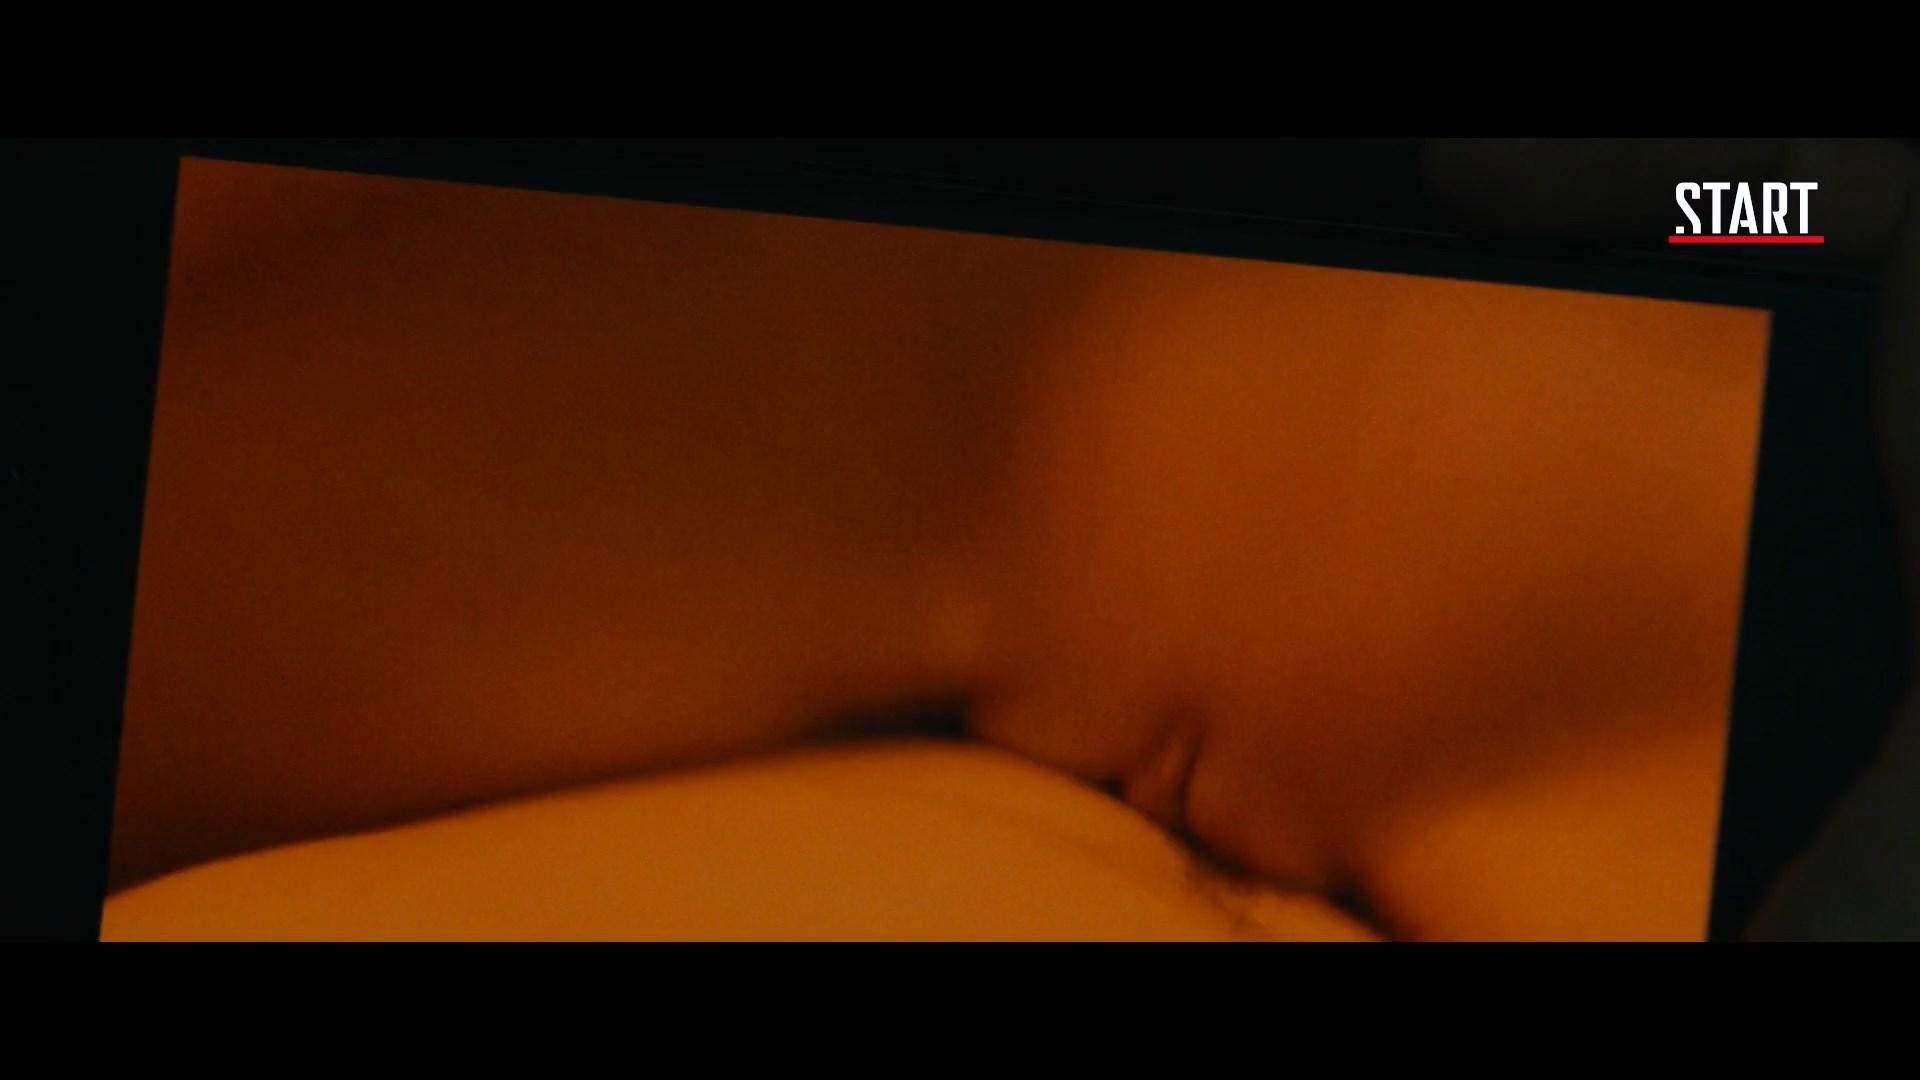 Порно Сцена Текст Без Цензуры